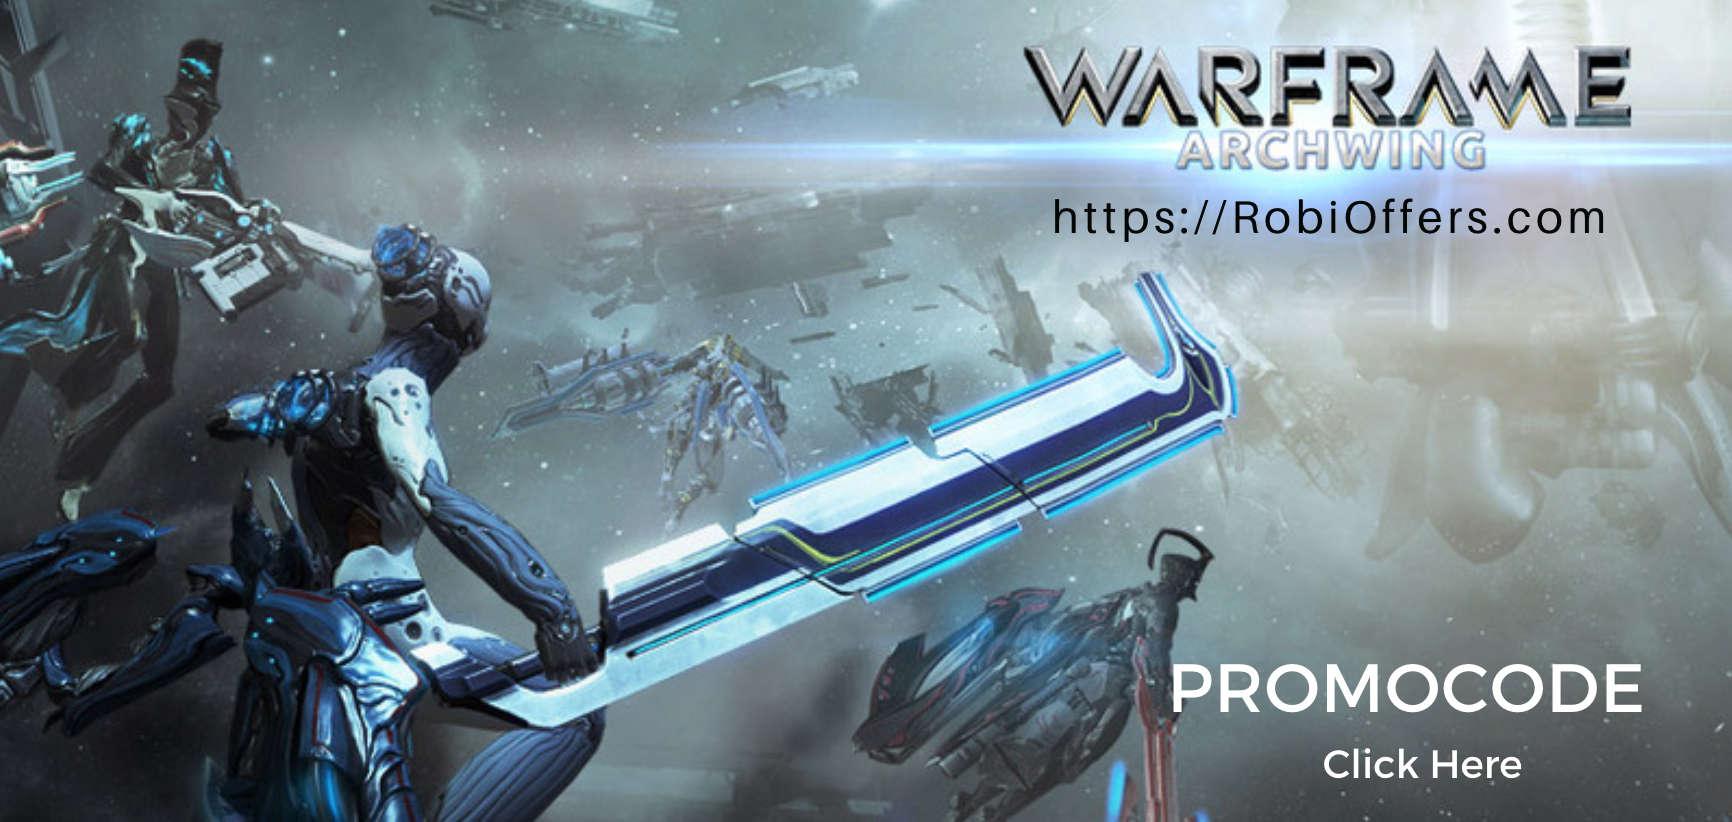 Warframe Promo Code 2021 Update (Free Redeem)